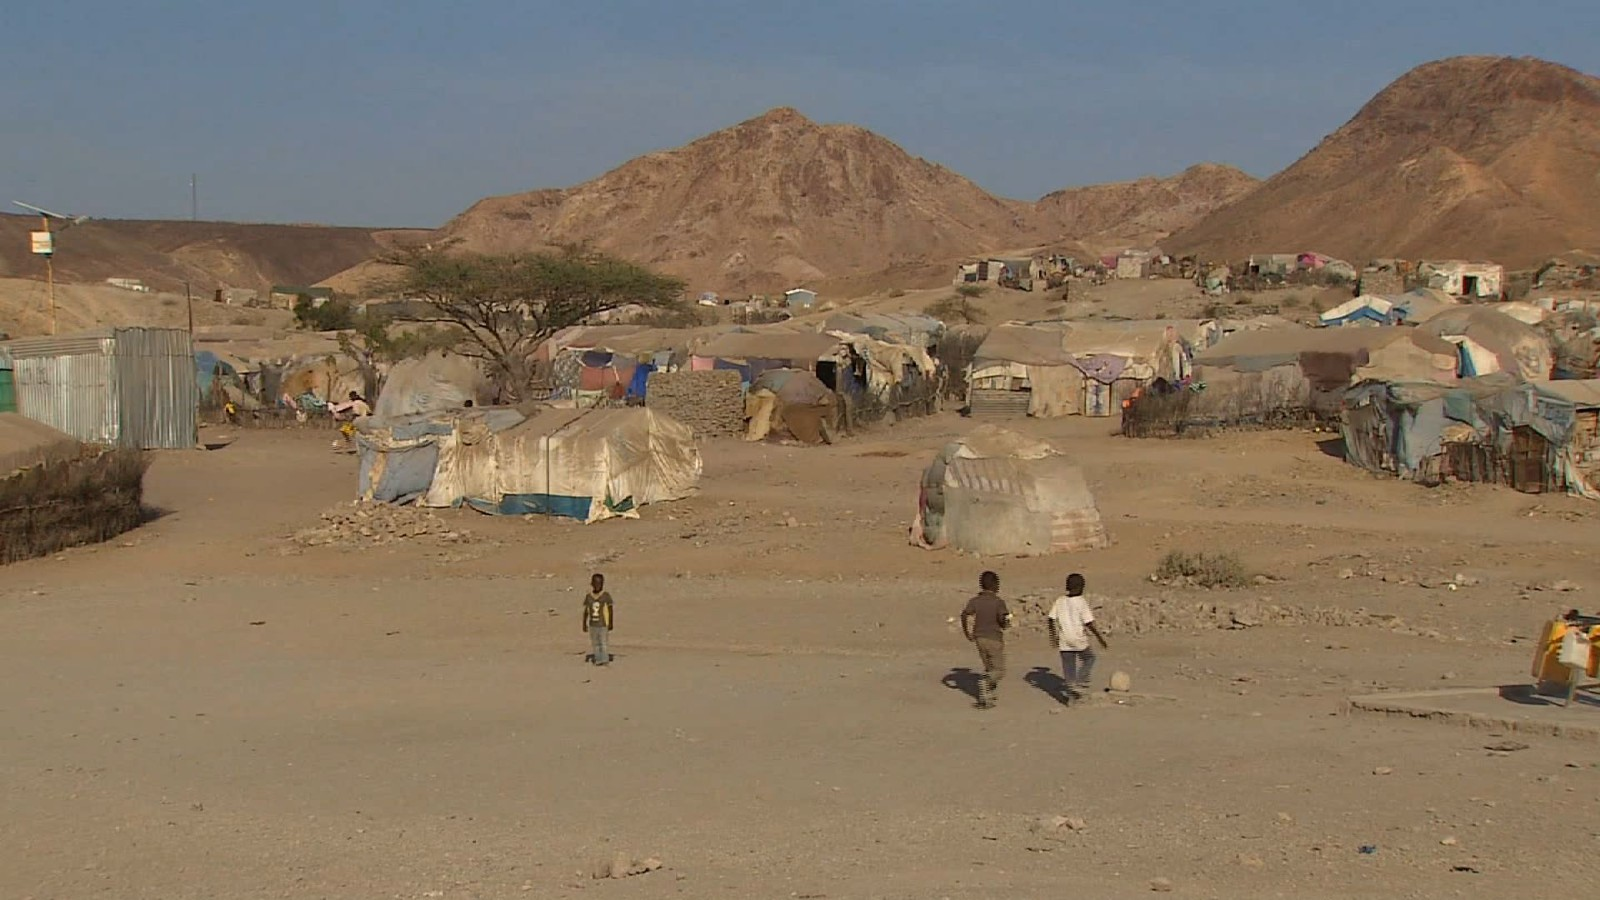 Migrants forced to flee Eritrea for uncertain future   CNN 1600x900